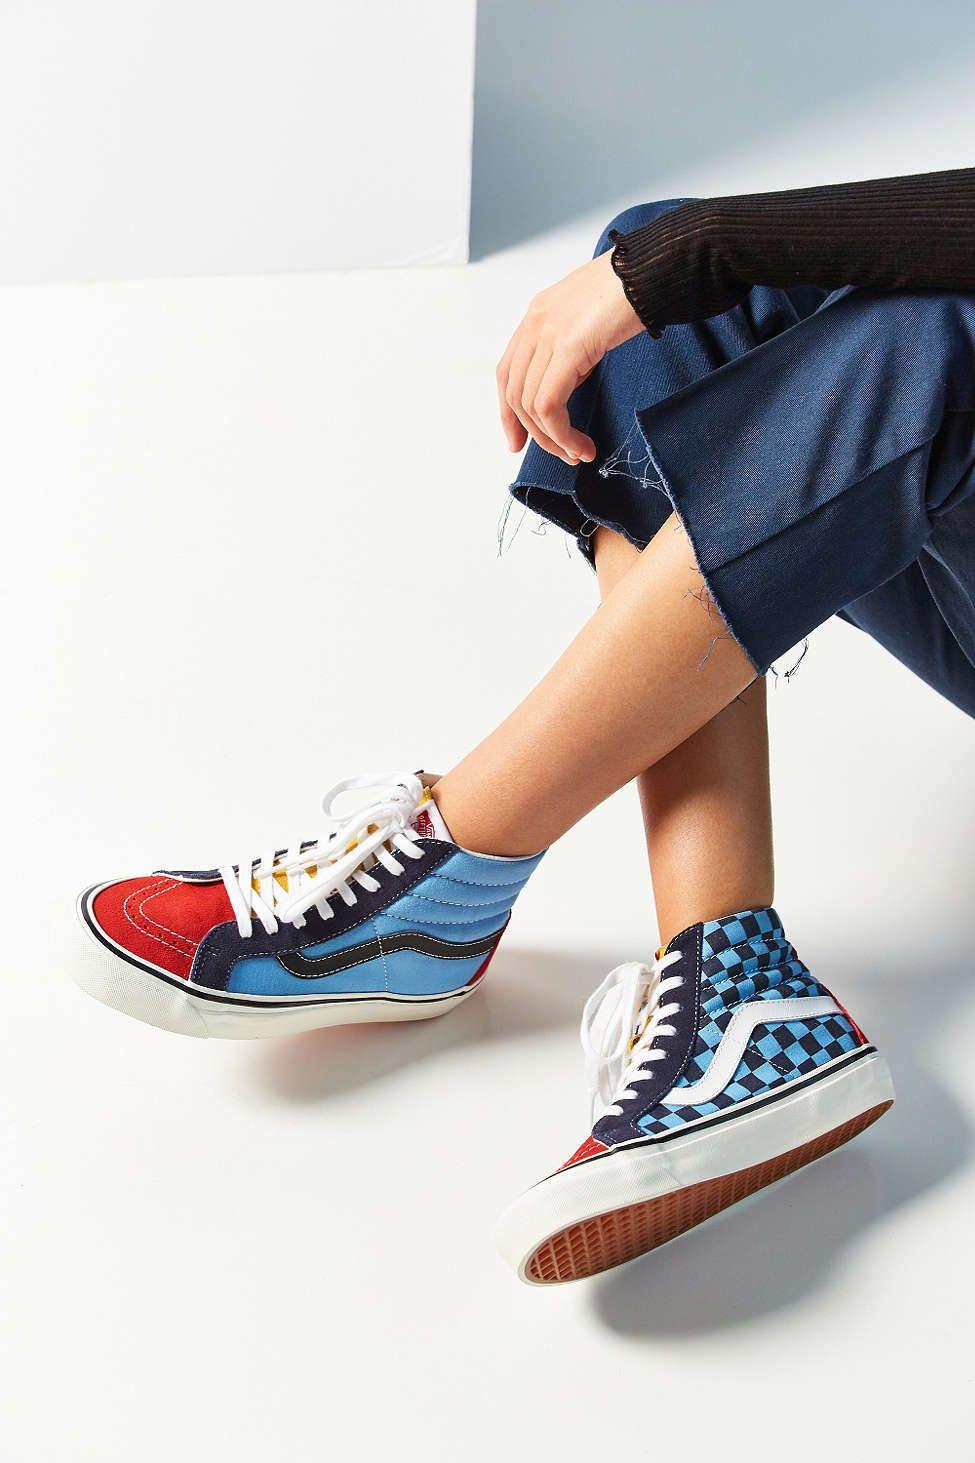 69ddf2cfe3 Vans 50th Sk8-Hi 38 Reissue Sneaker